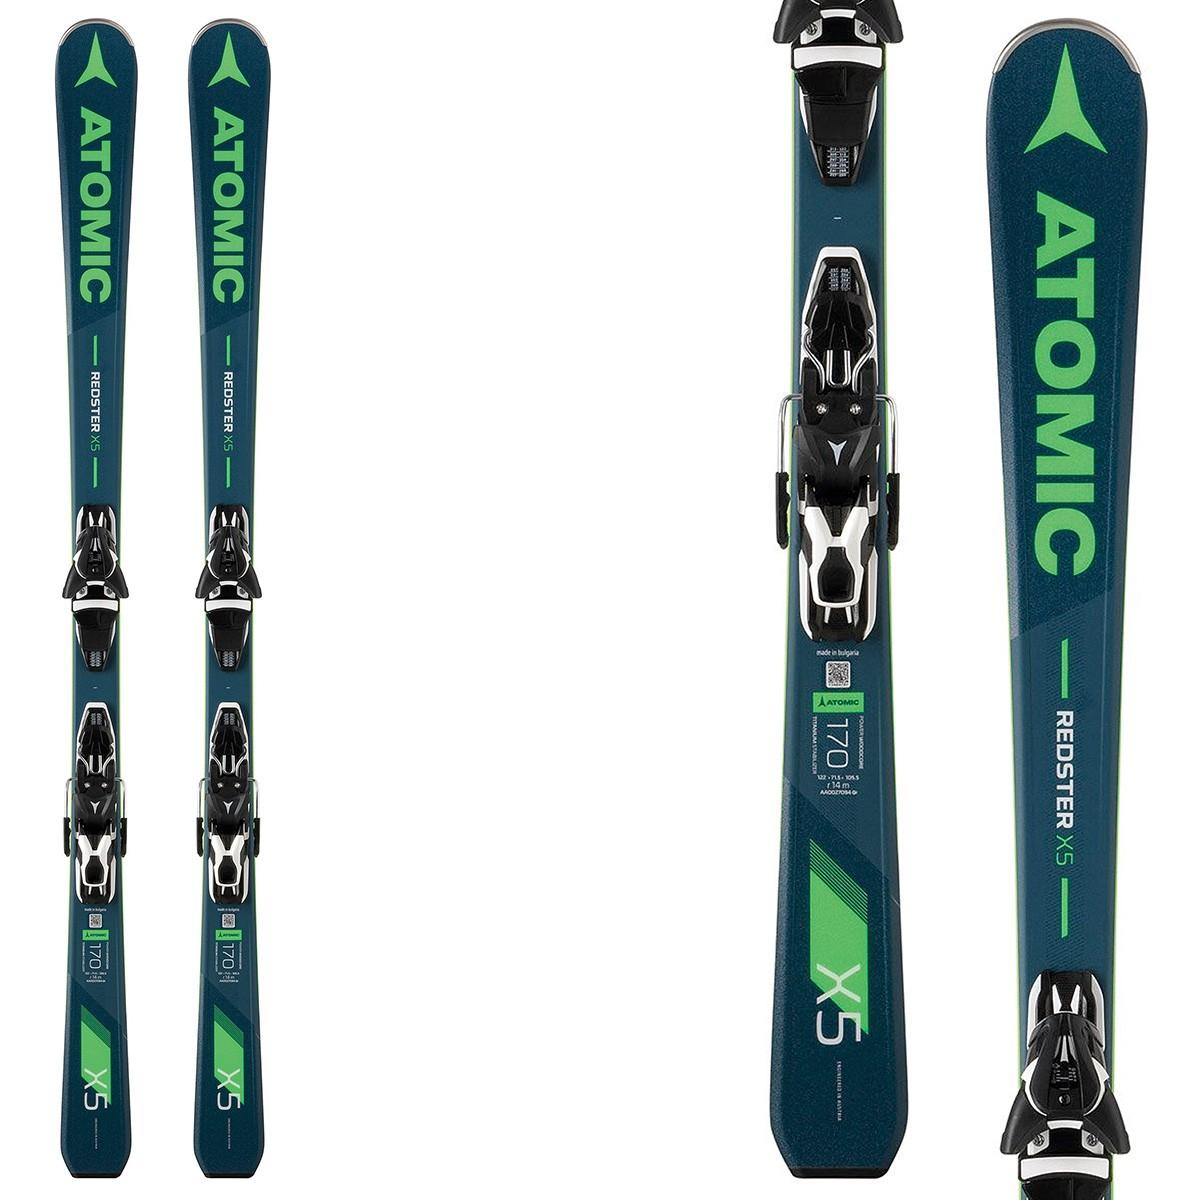 Rewelacyjny Ski Atomic Redster X5 + bindings Ft 11 - Race skis JY27